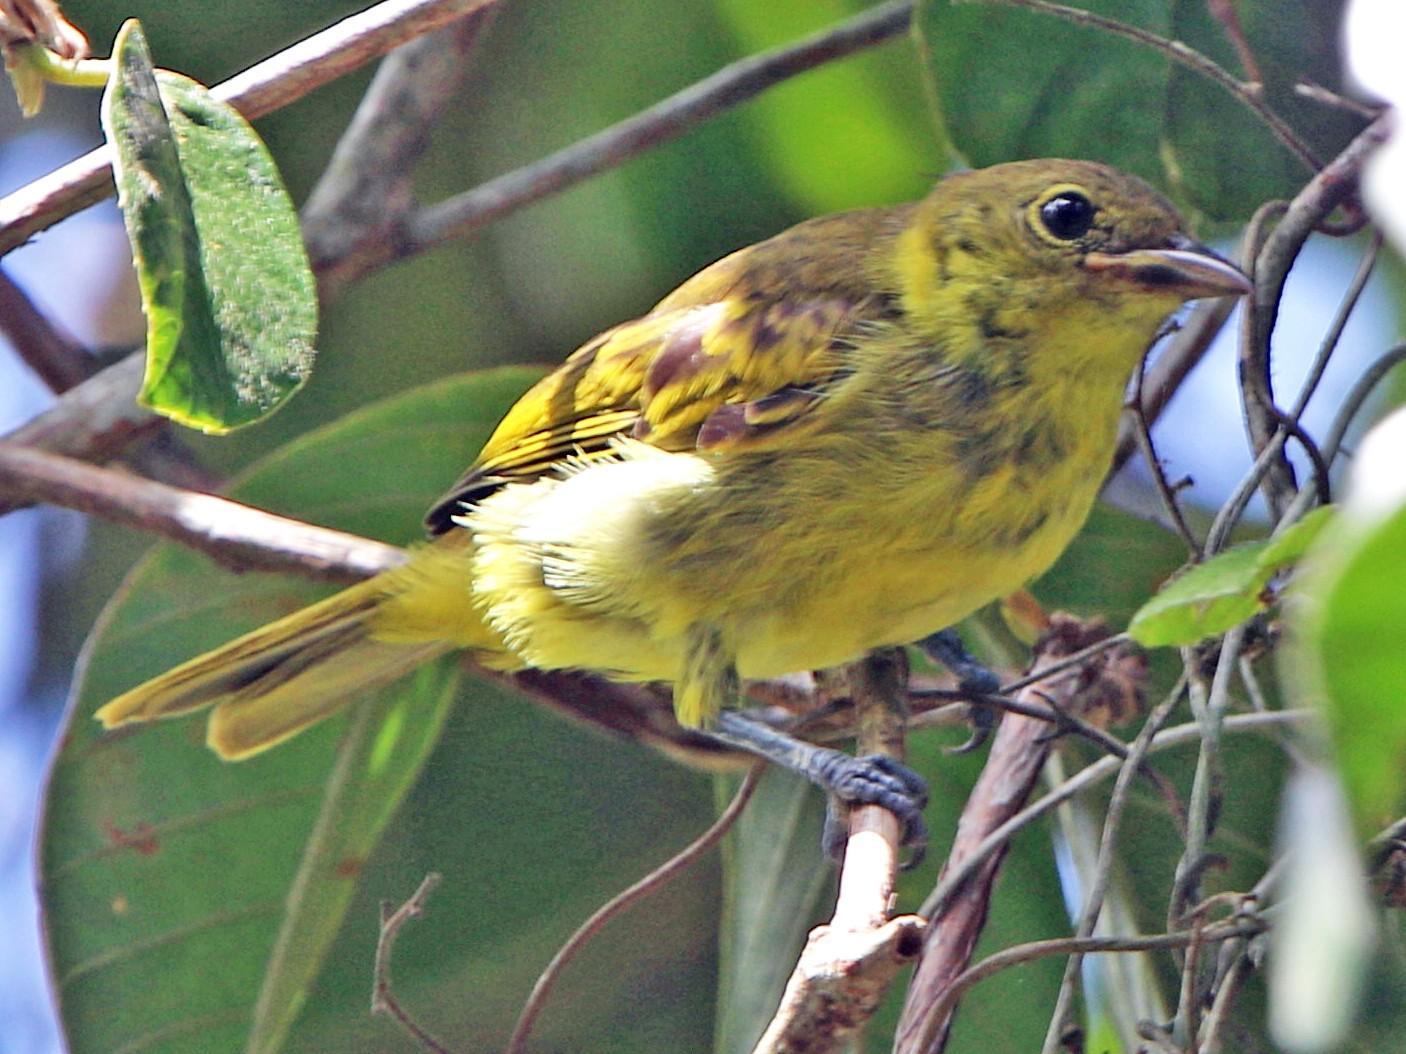 Yellow-backed Tanager - Thompson Ian